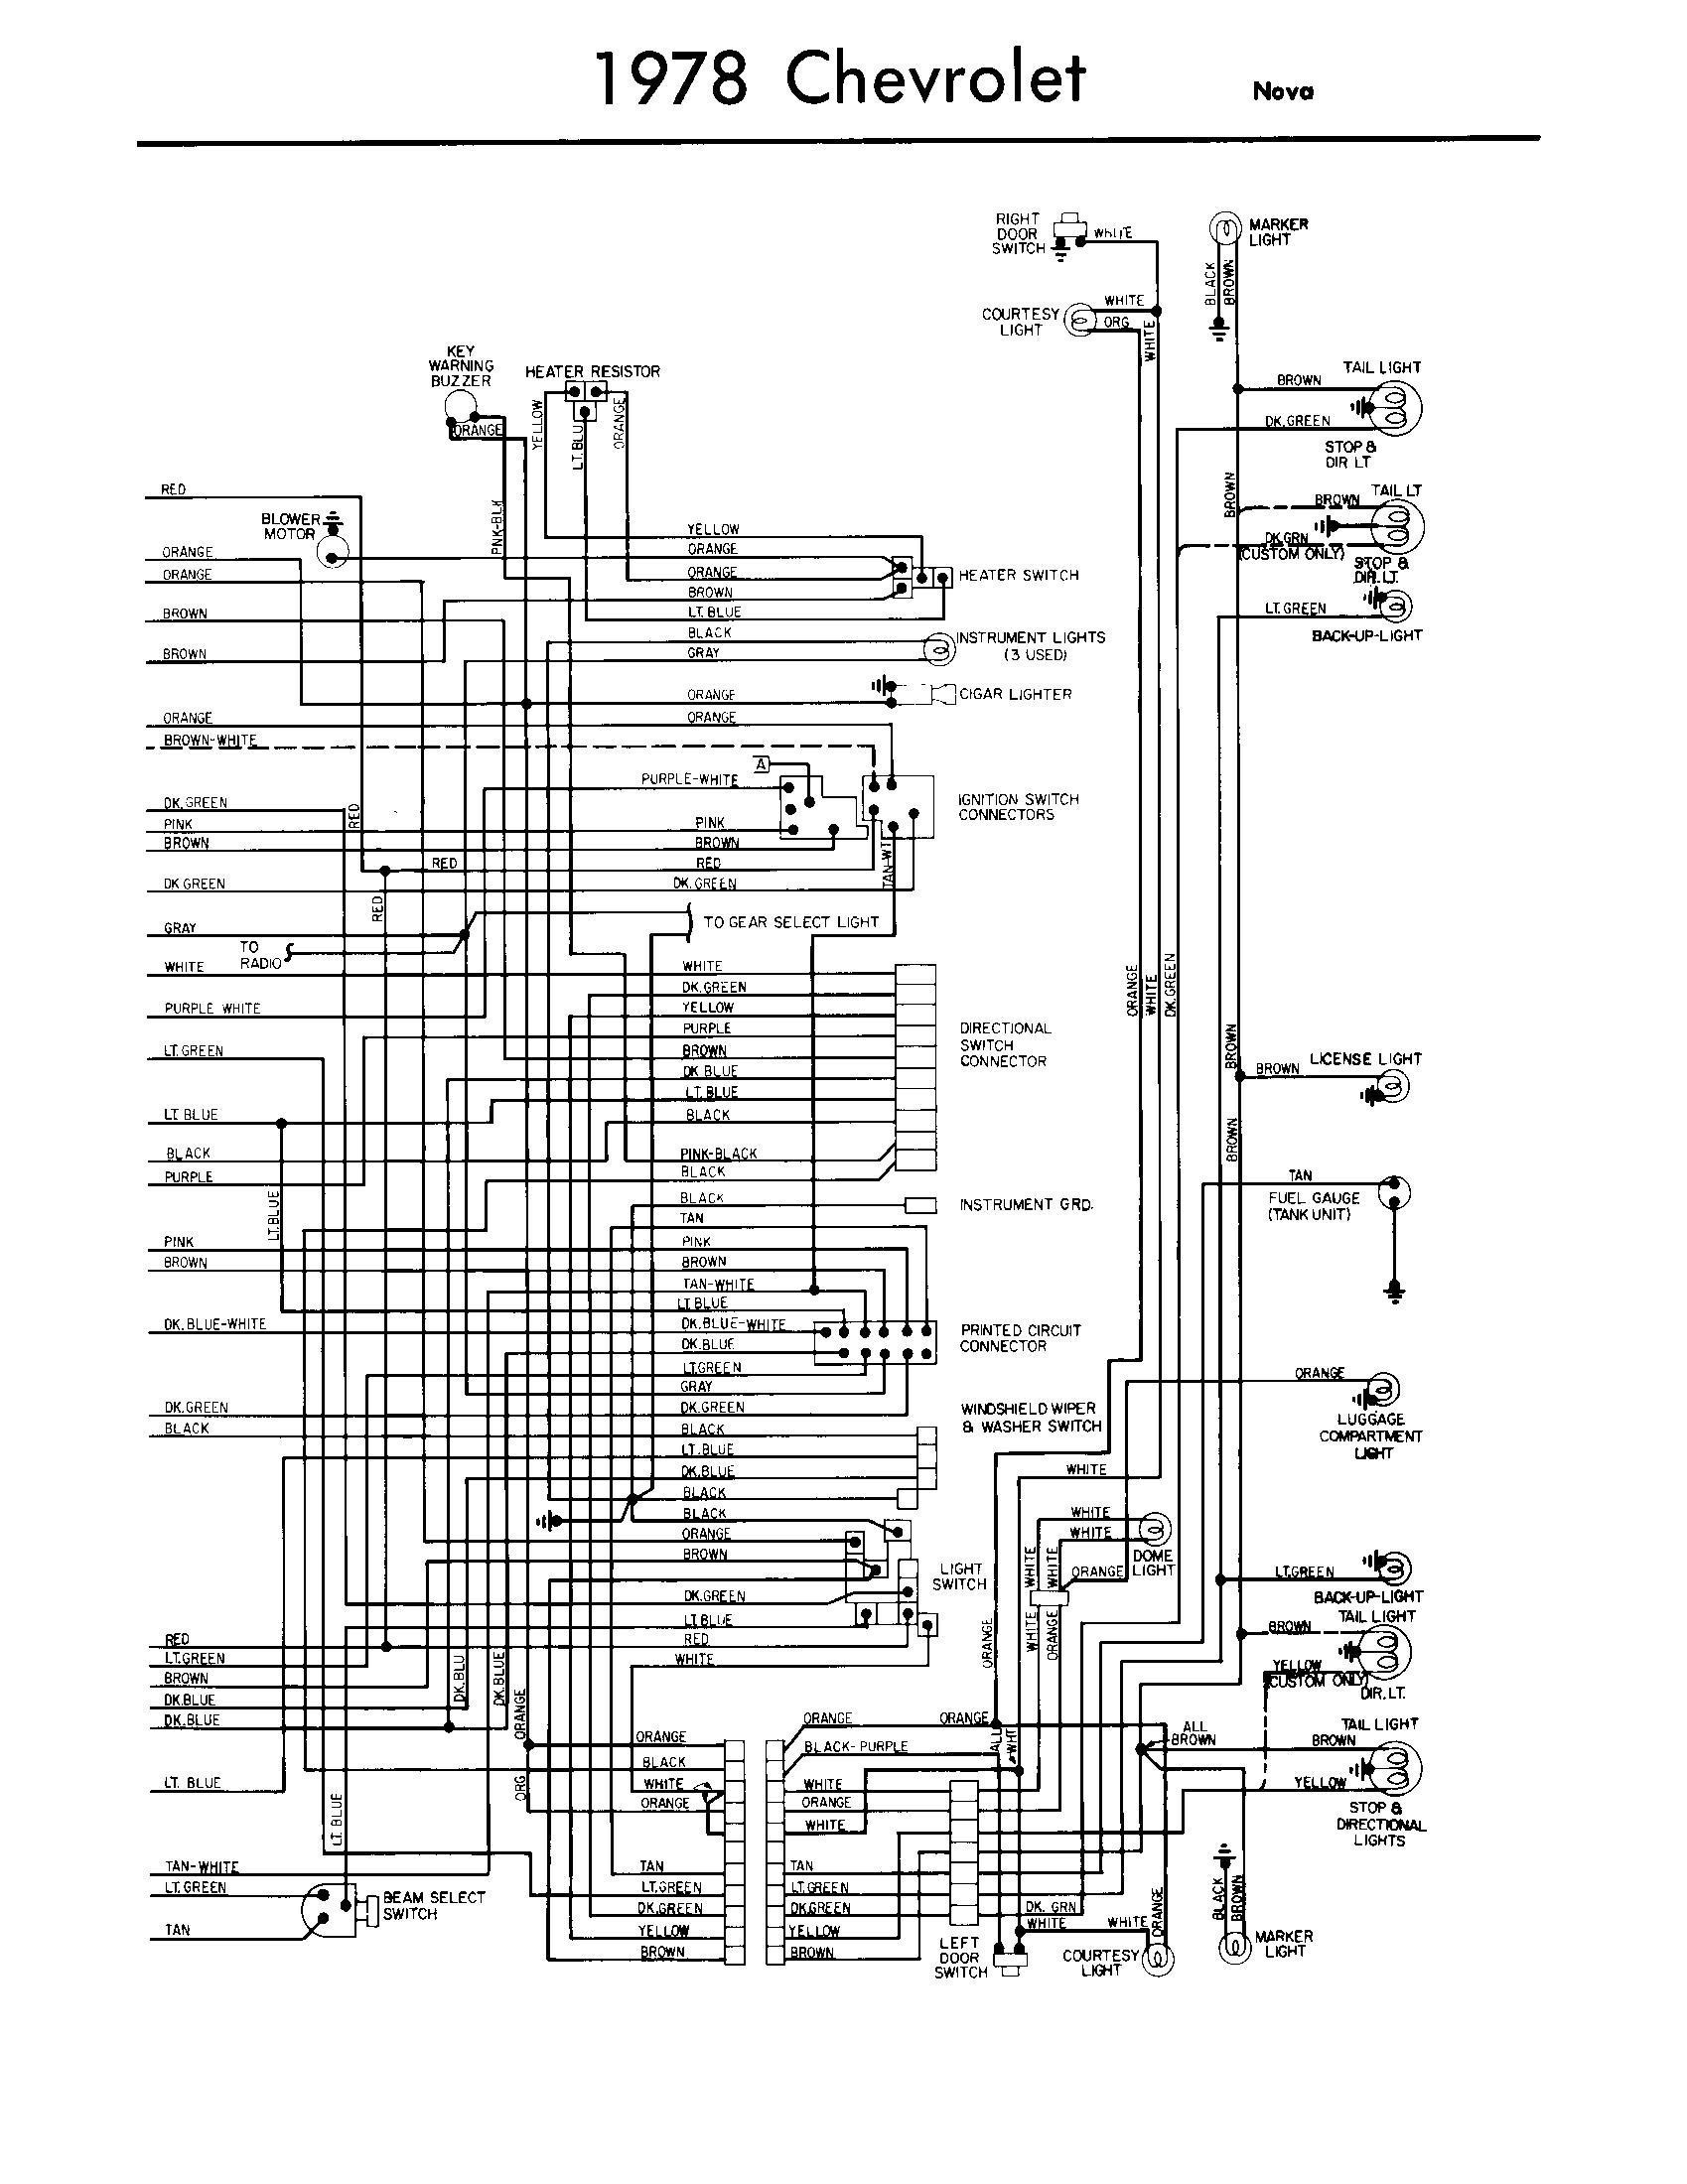 1969 Chevy Starter Wiring | Manual E-Books - Chevy Starter Wiring Diagram